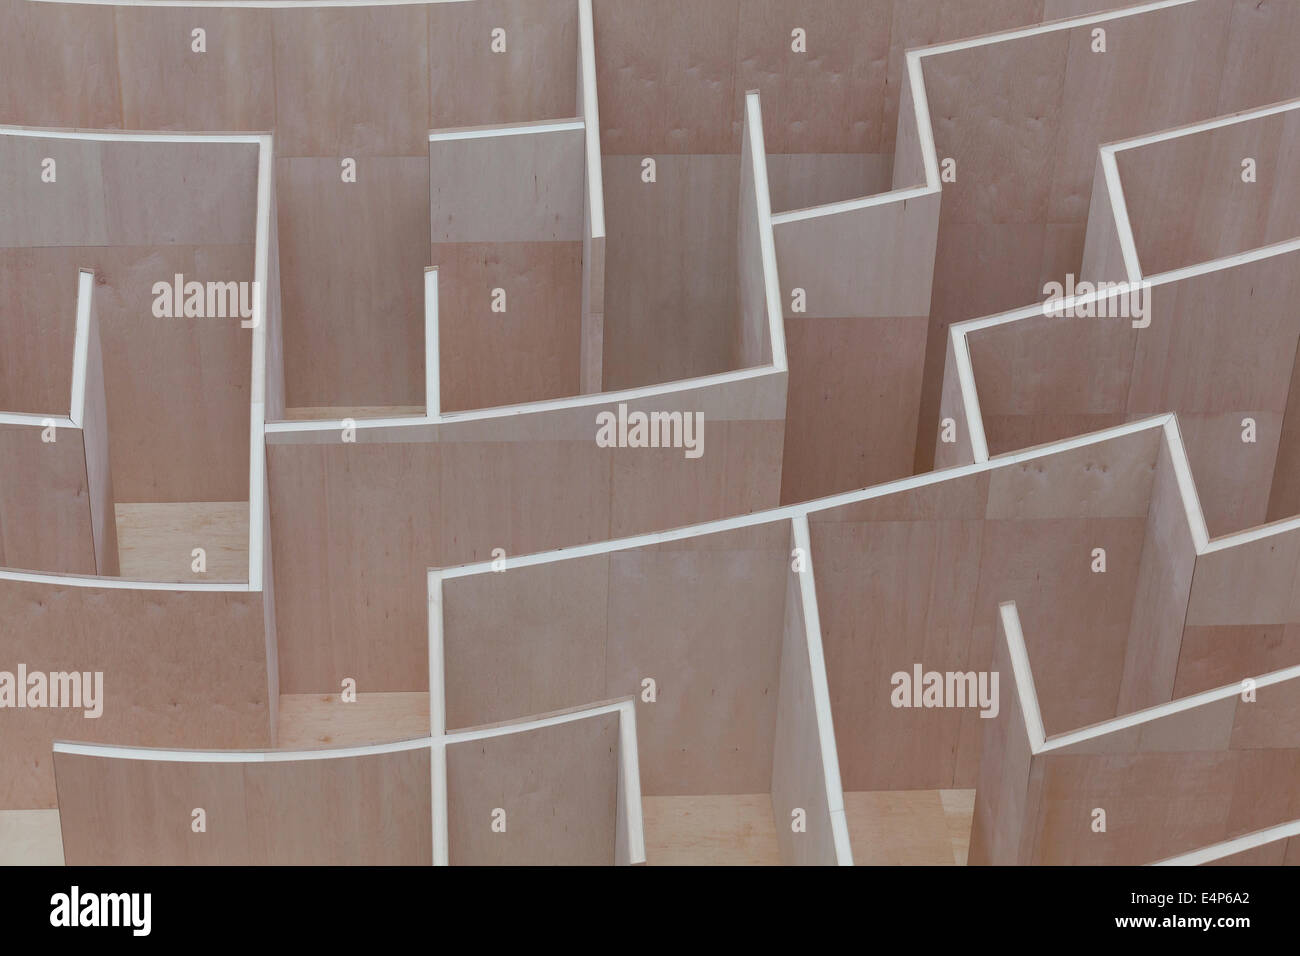 Su larga scala a labirinto National Building Museum - Washington DC, Stati Uniti d'America Immagini Stock